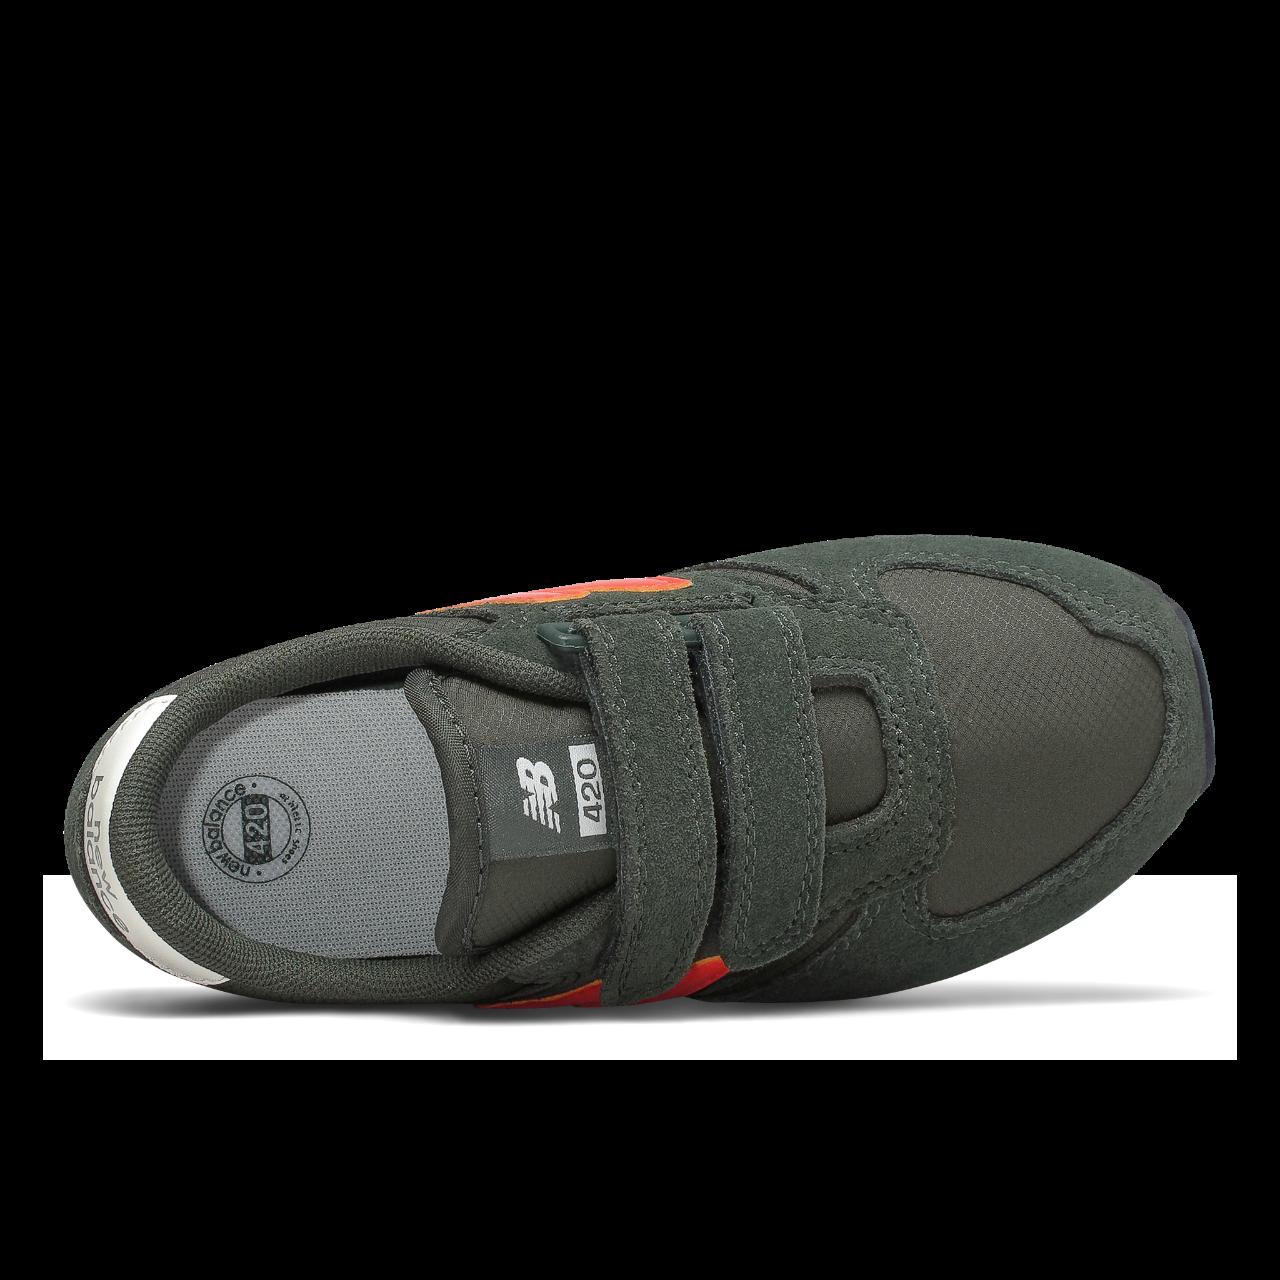 New Balance 420 sneakers, dark green, US 1.5